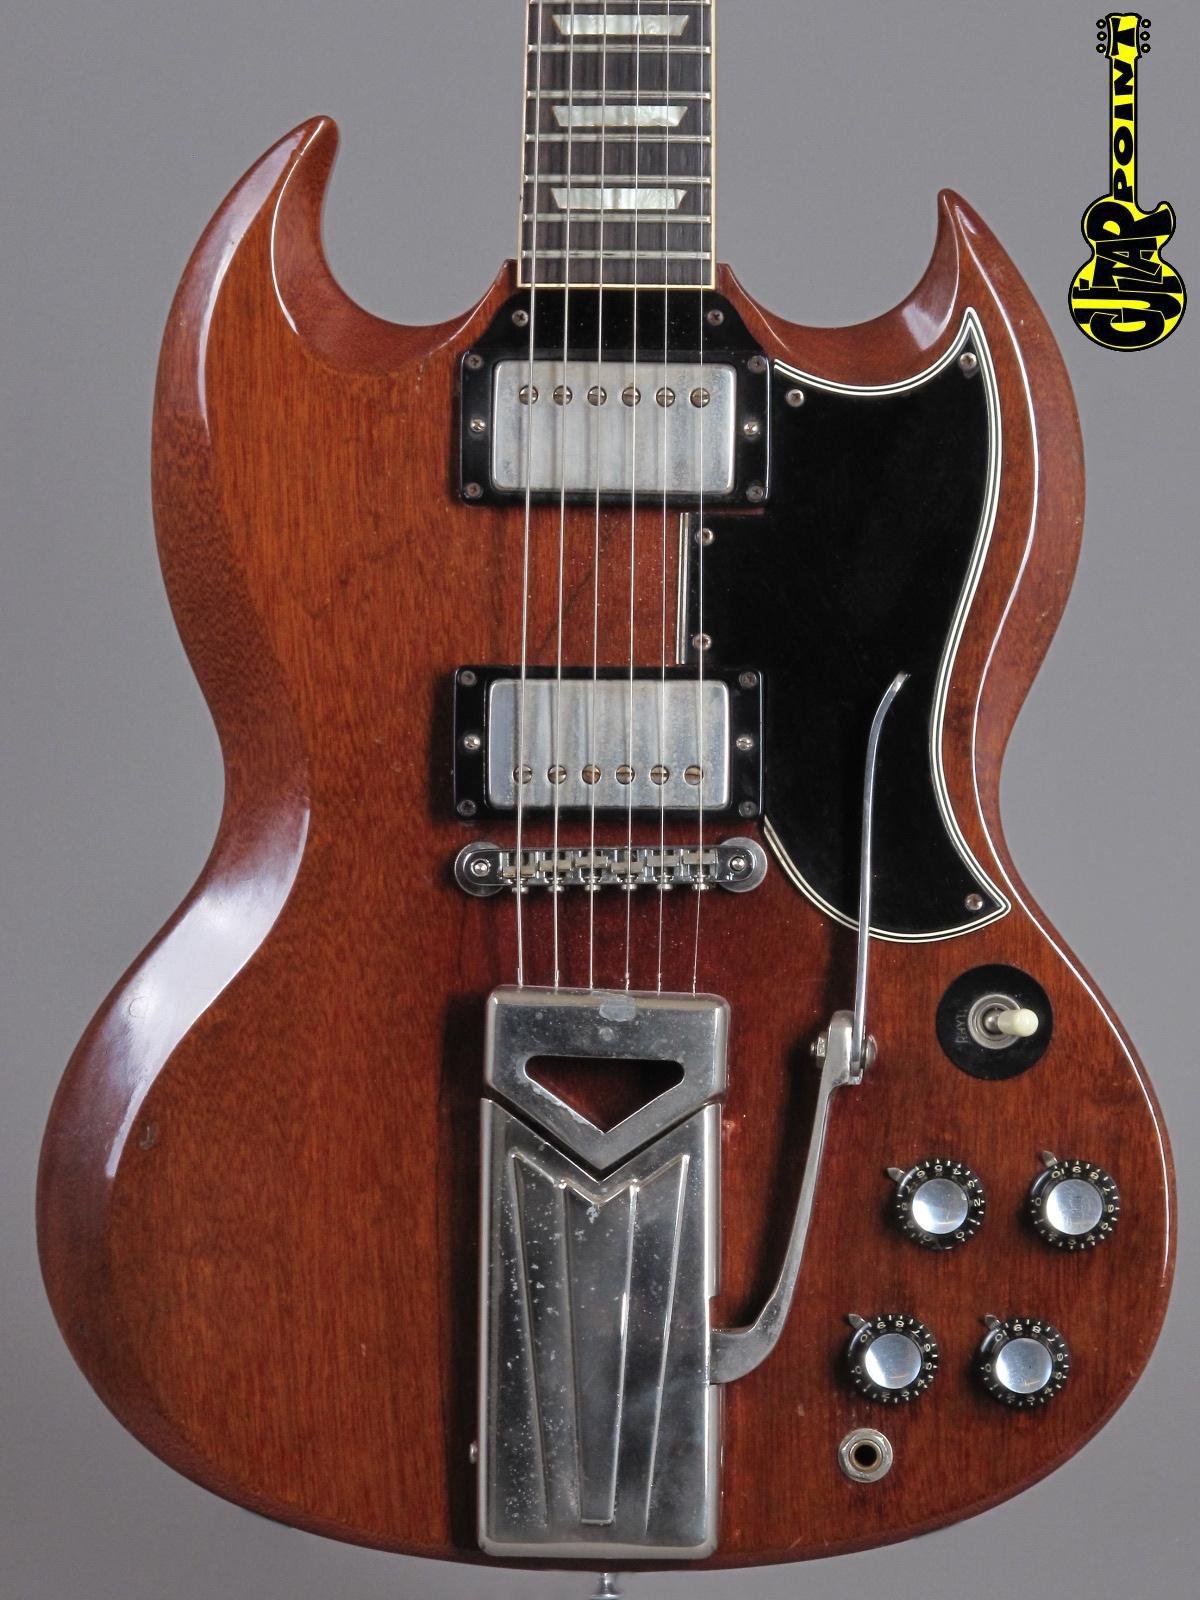 1961 Gibson Les Paul (SG) Standard - Cherry (2xPAF´s)